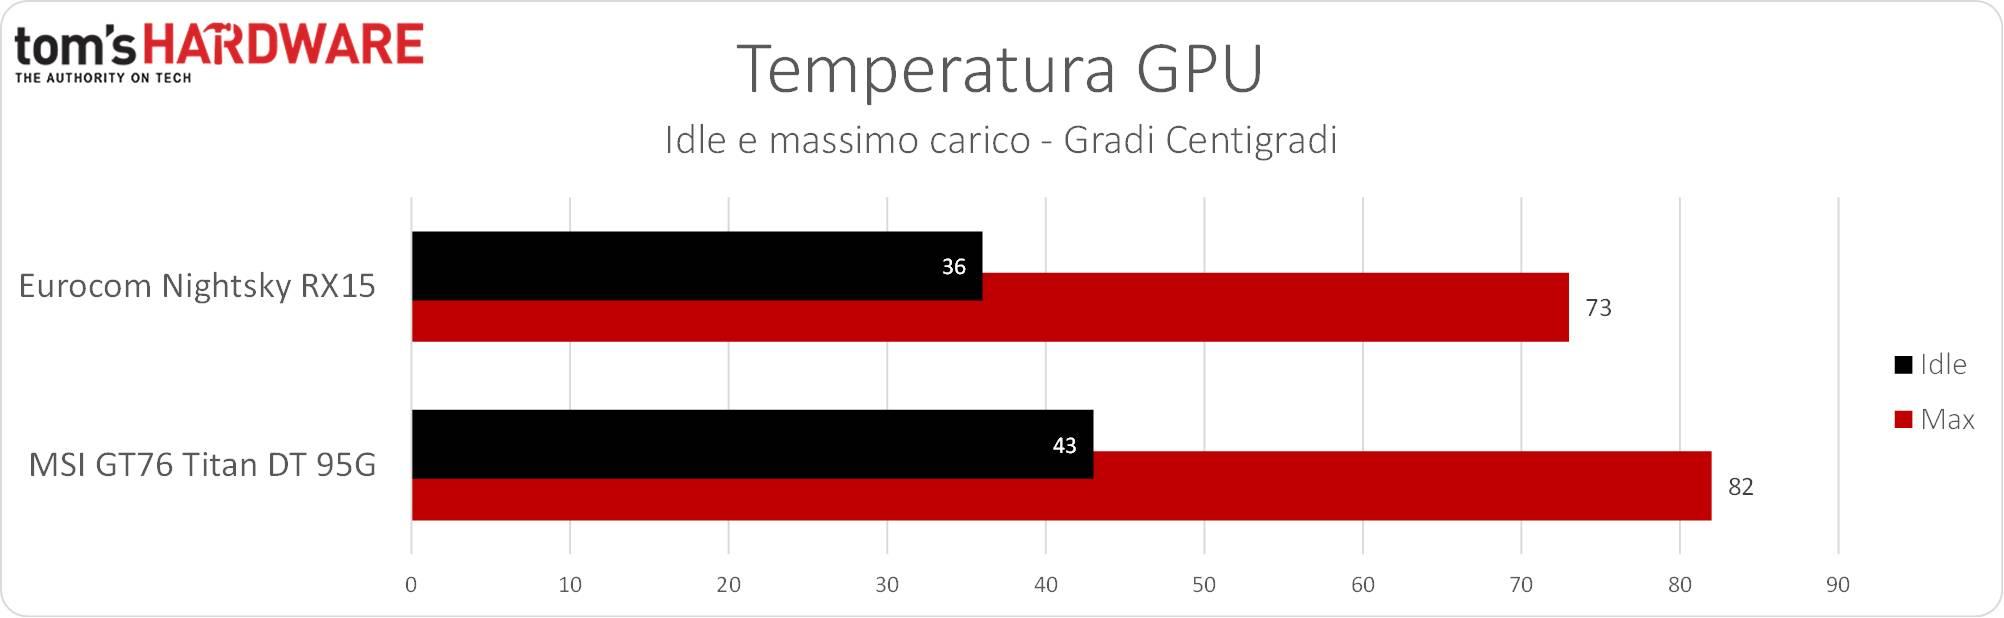 Eurocom Nightsky RX15 - Temp. GPU